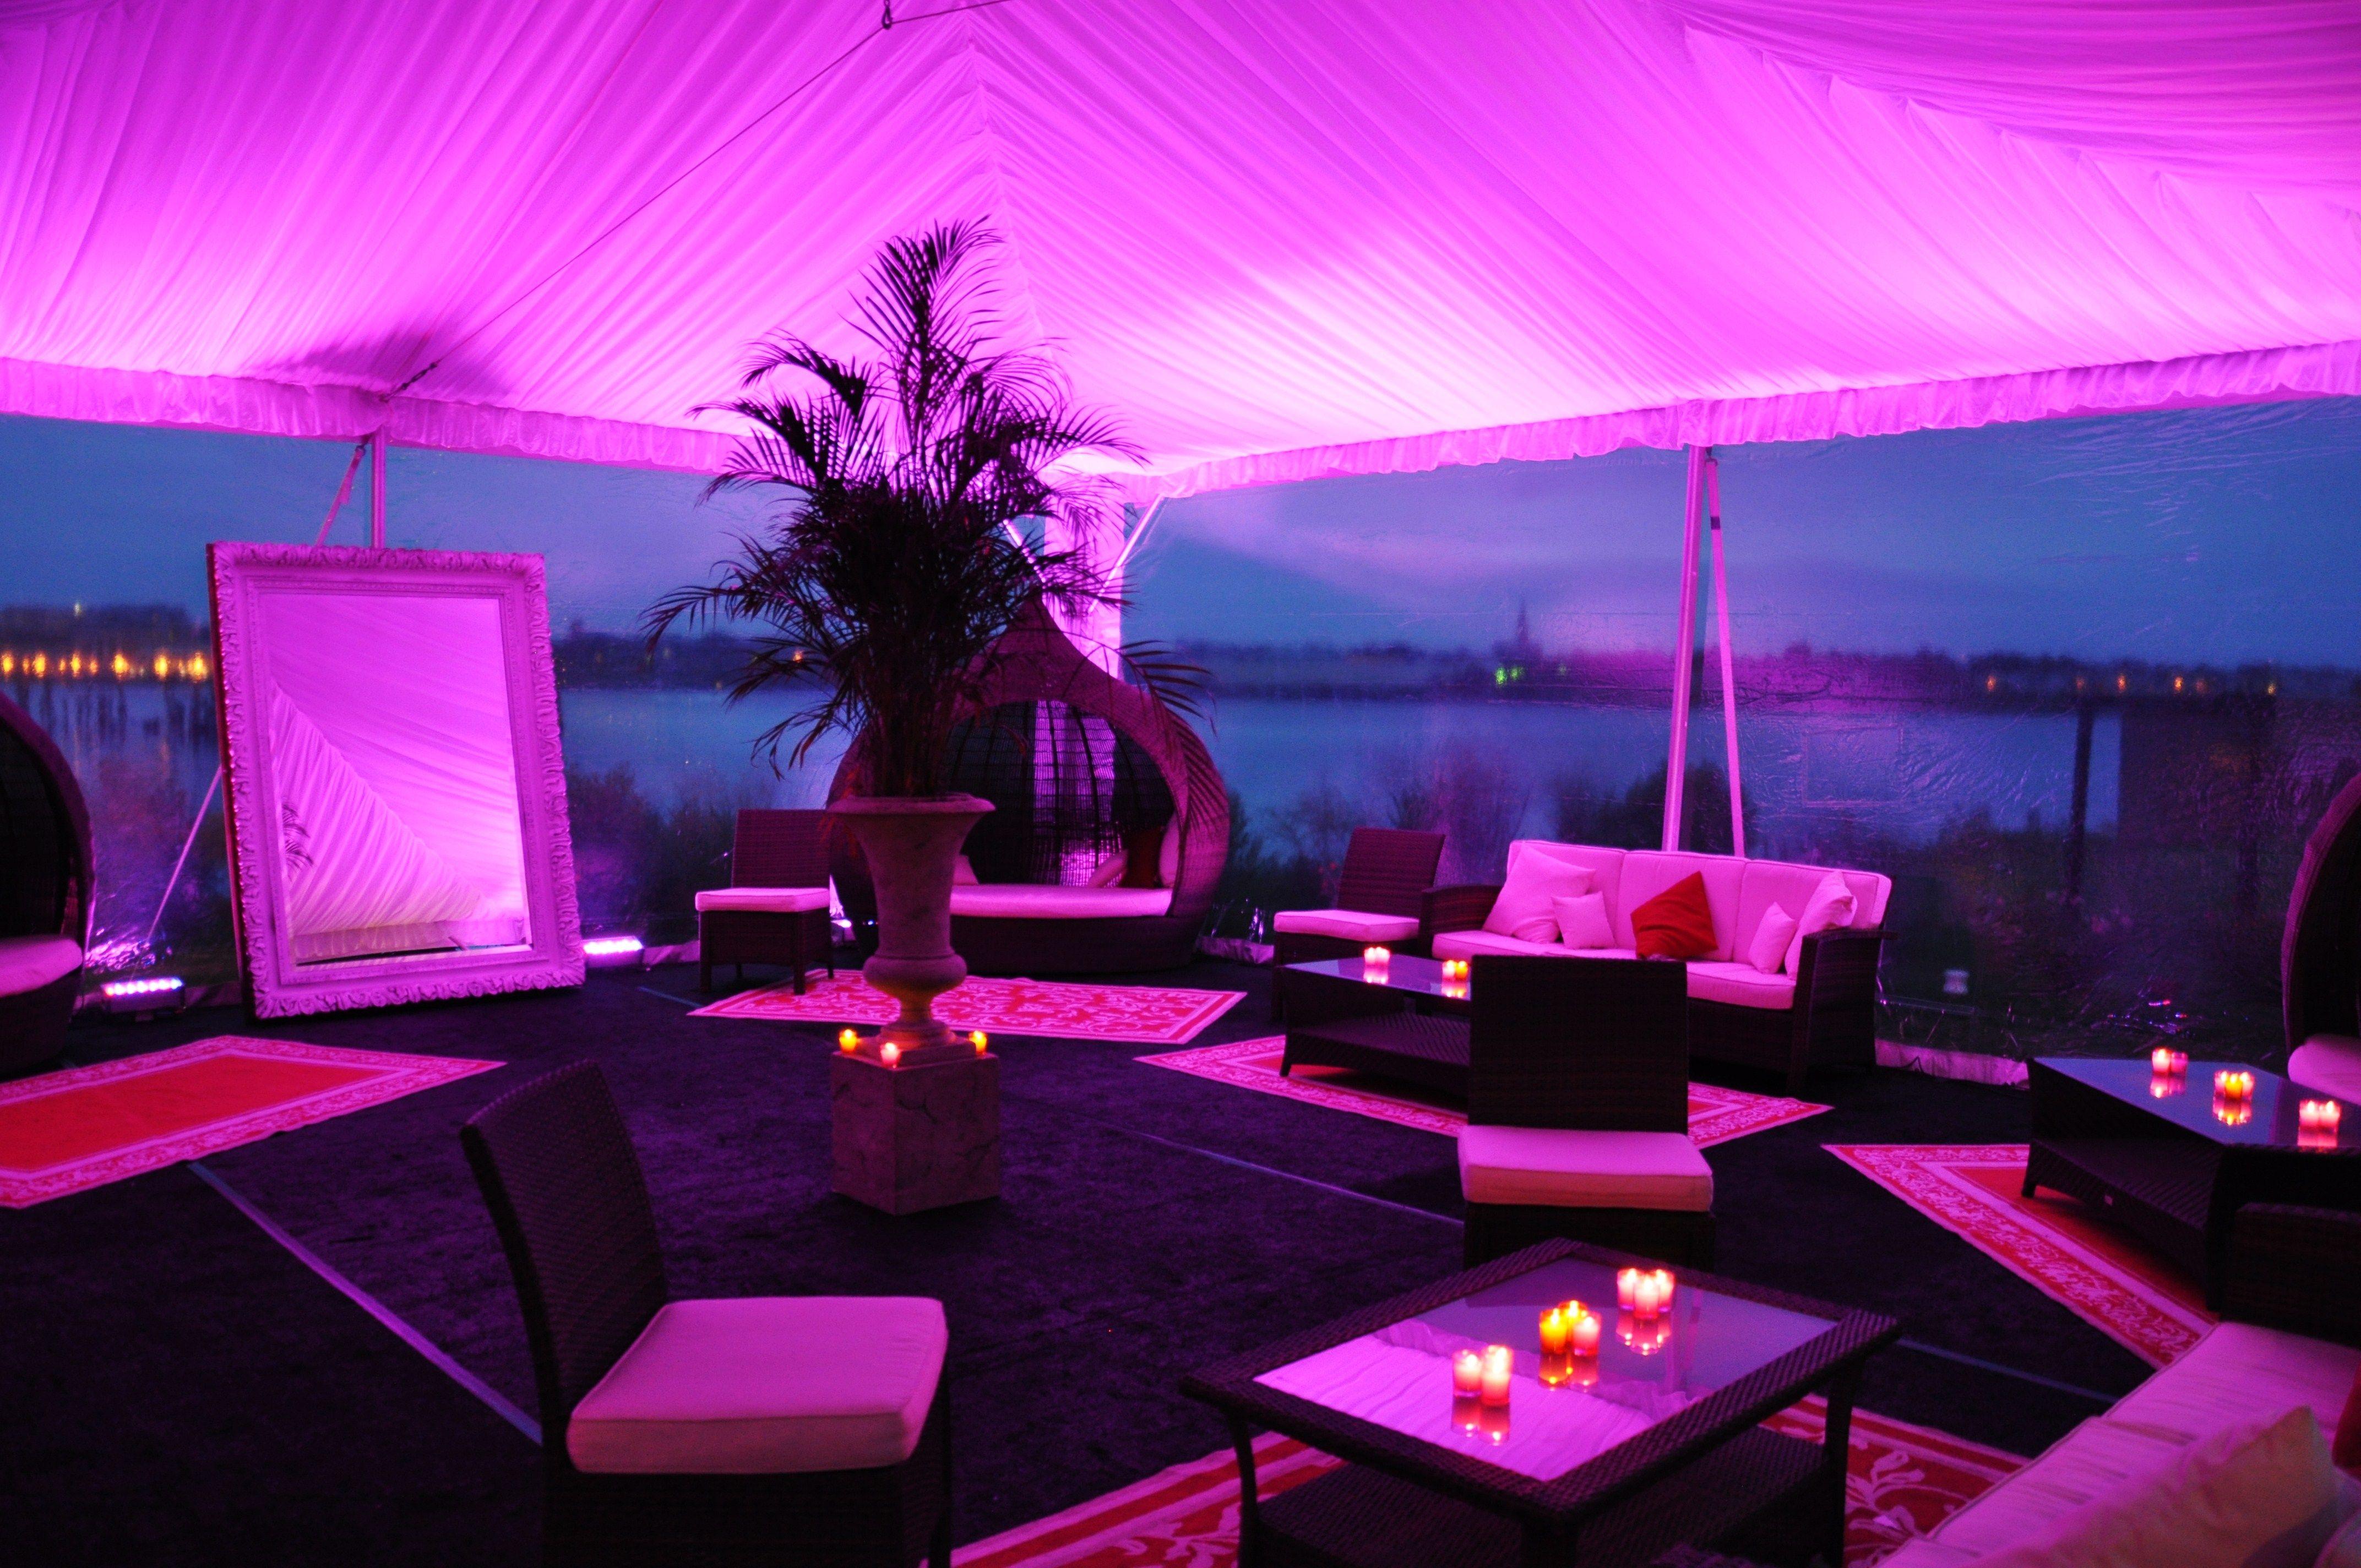 Lounge Tent Purple Uplighting Angelinau0027s Ristorante 399 Ellis Street Staten Island NY 10307 & Lounge Tent Purple Uplighting Angelinau0027s Ristorante 399 Ellis ...